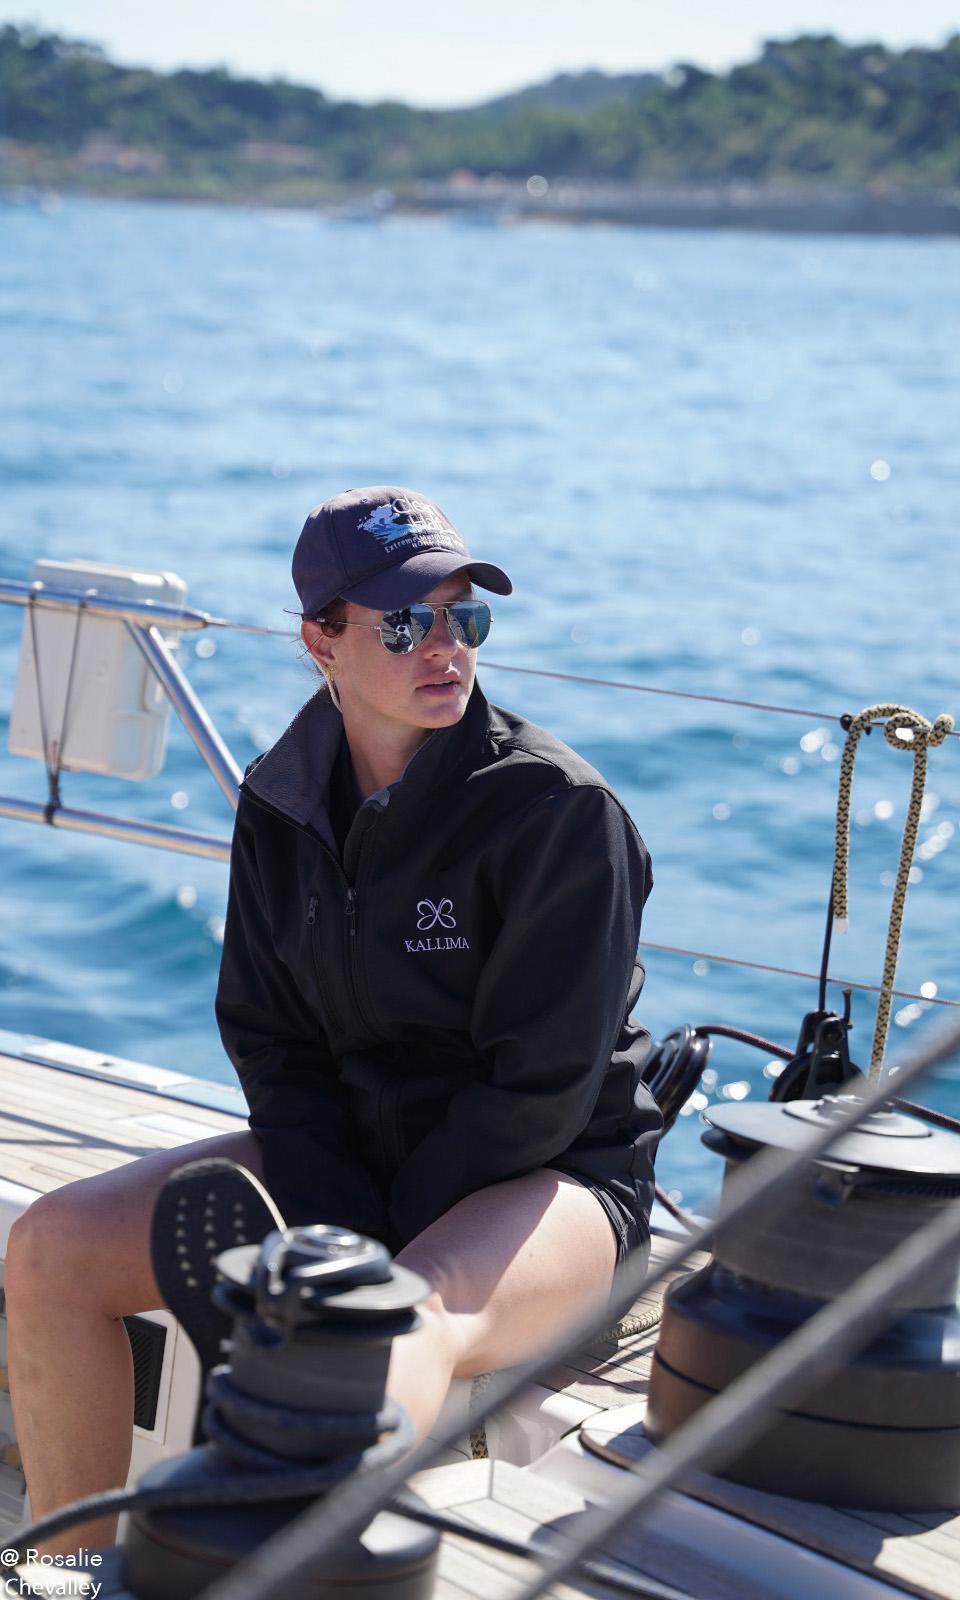 Tara Barot sailing crew on Kallima Swan 82 yacht charter during Les Voiles de Saint Tropez 2020 - Photo by Rosalie Chevalley photographer